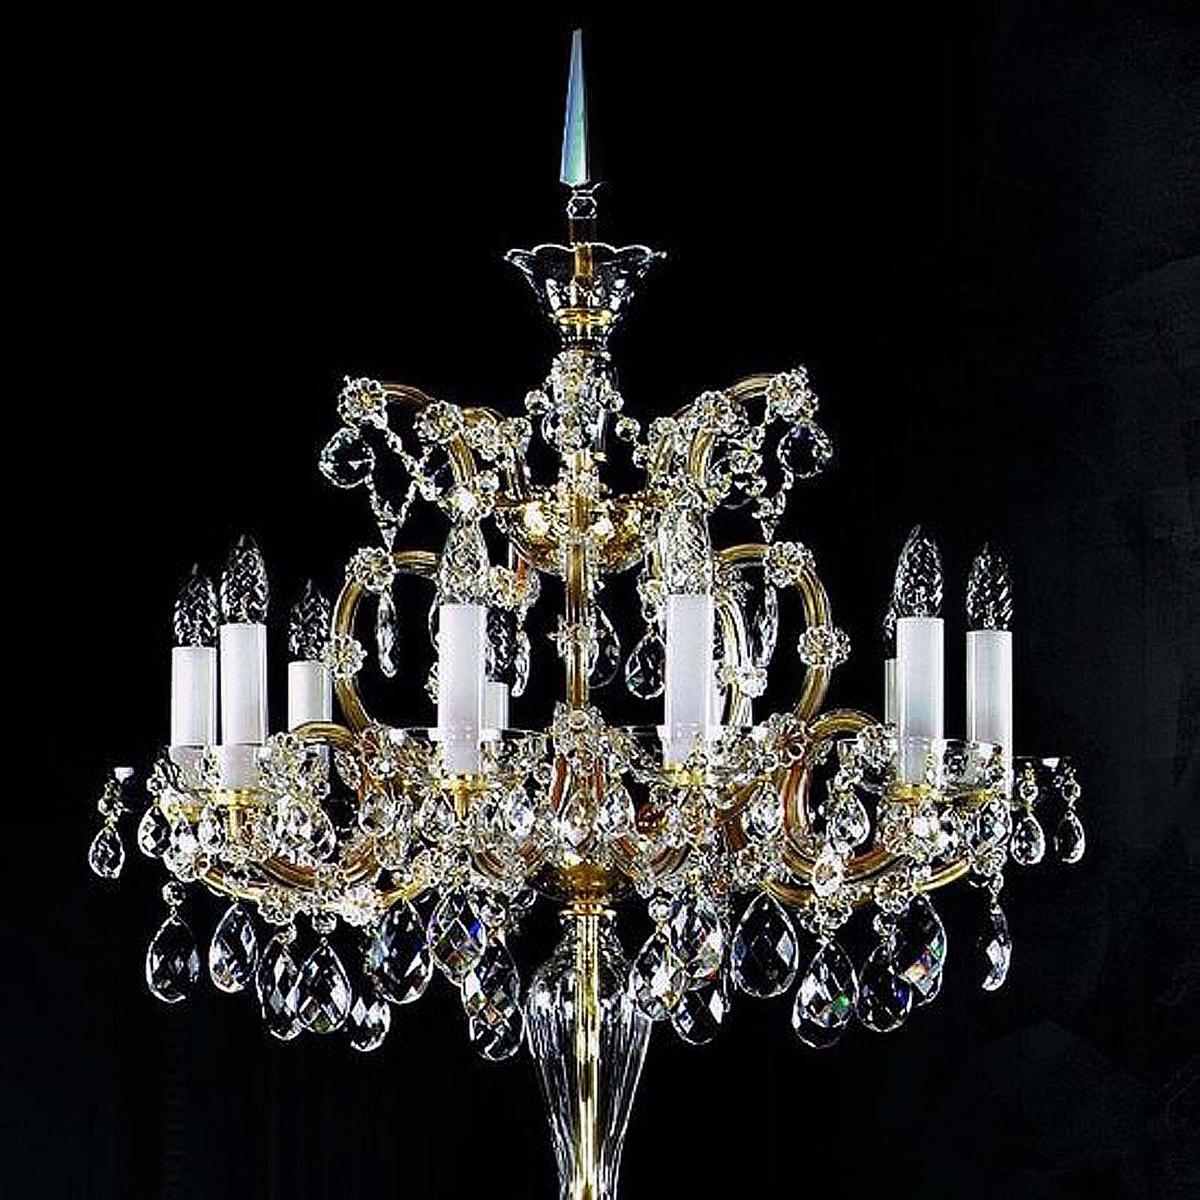 Lampadaire en cristal MARIA TEREZIA 16 FL